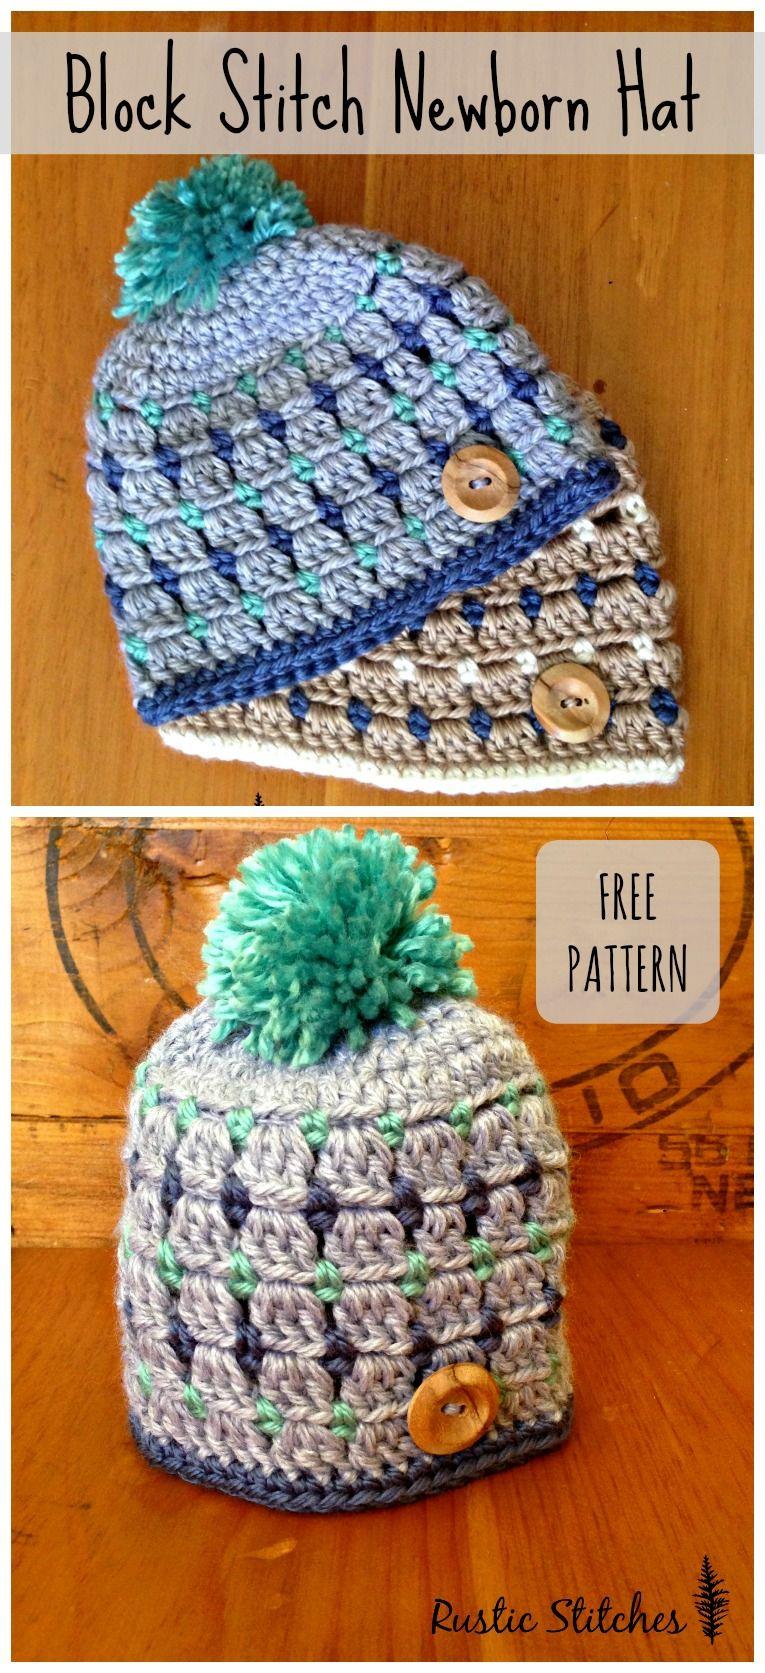 Crochet Newborn Hat - Free Pattern   Baby Things   Pinterest ...